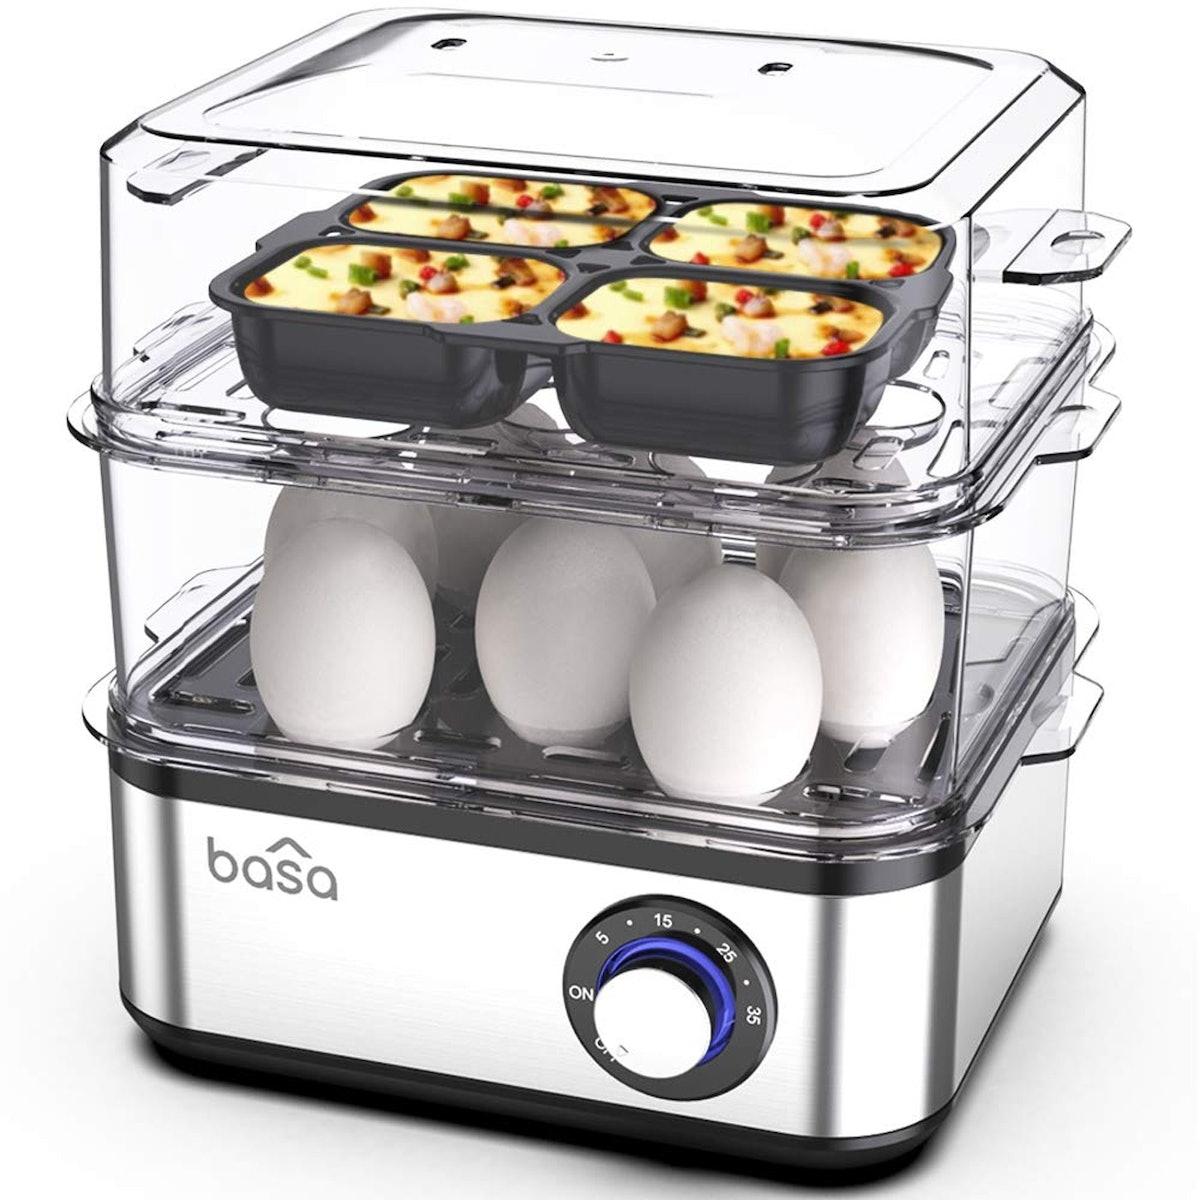 BASA Egg Cooker